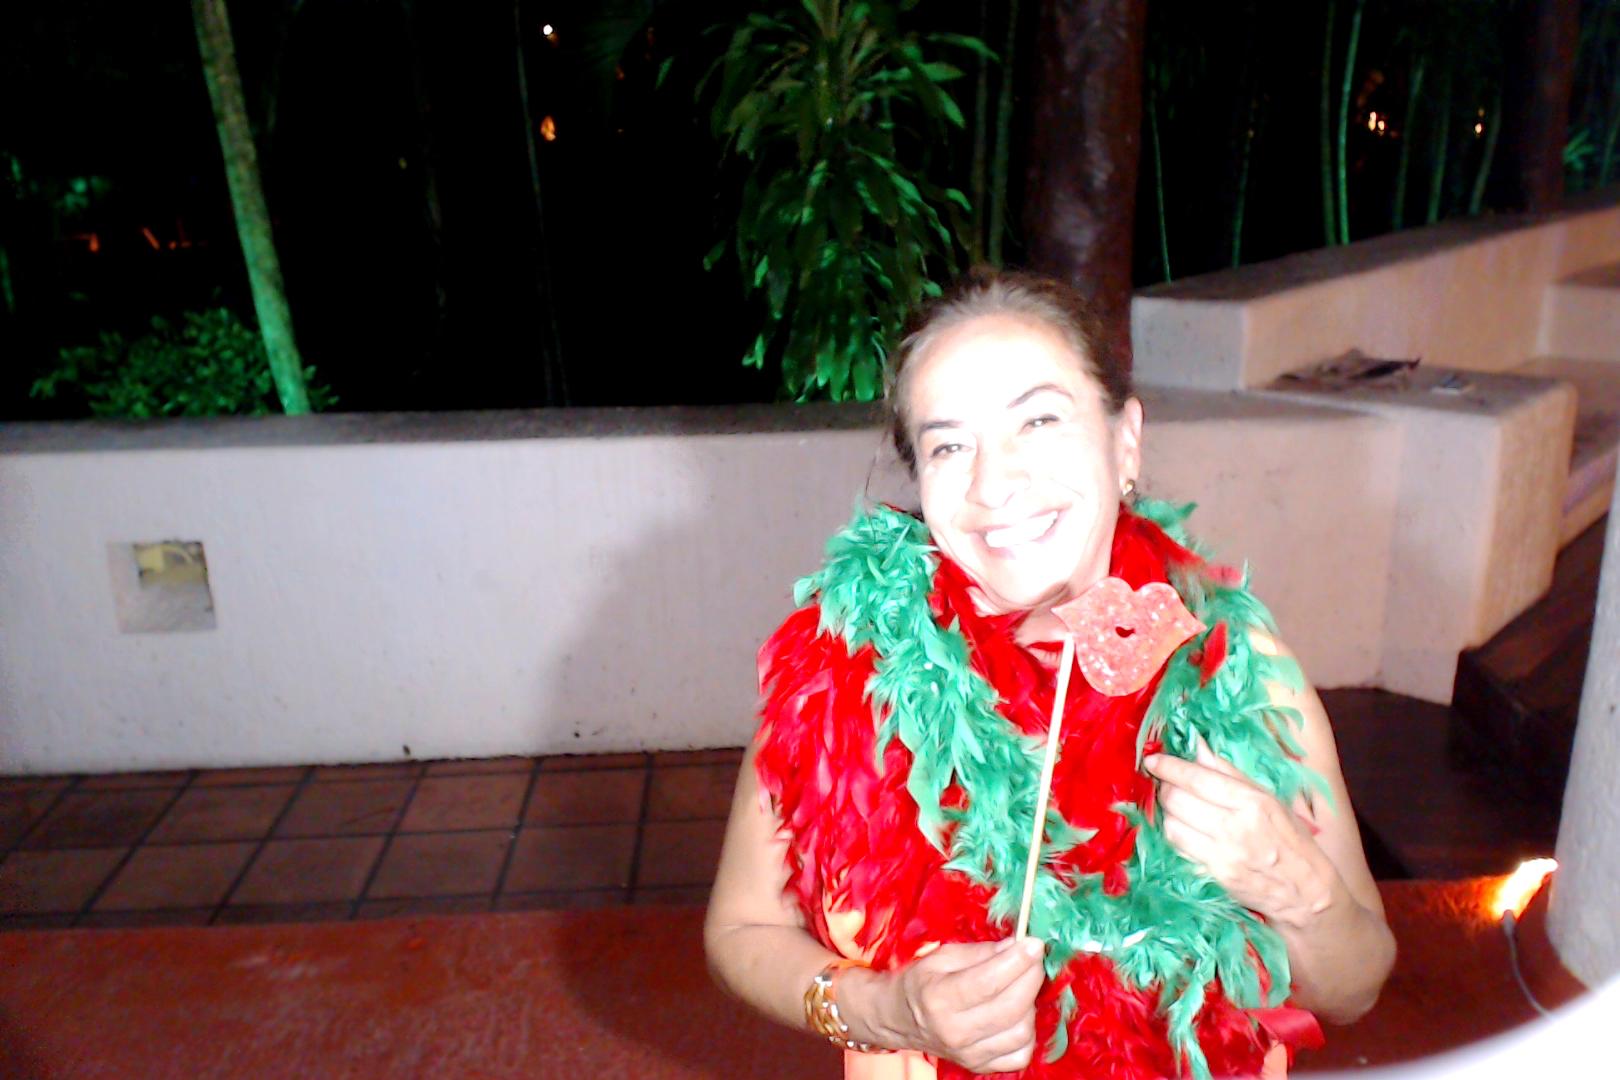 PlayadelCarmenPhotoBoothMexico0045.JPG